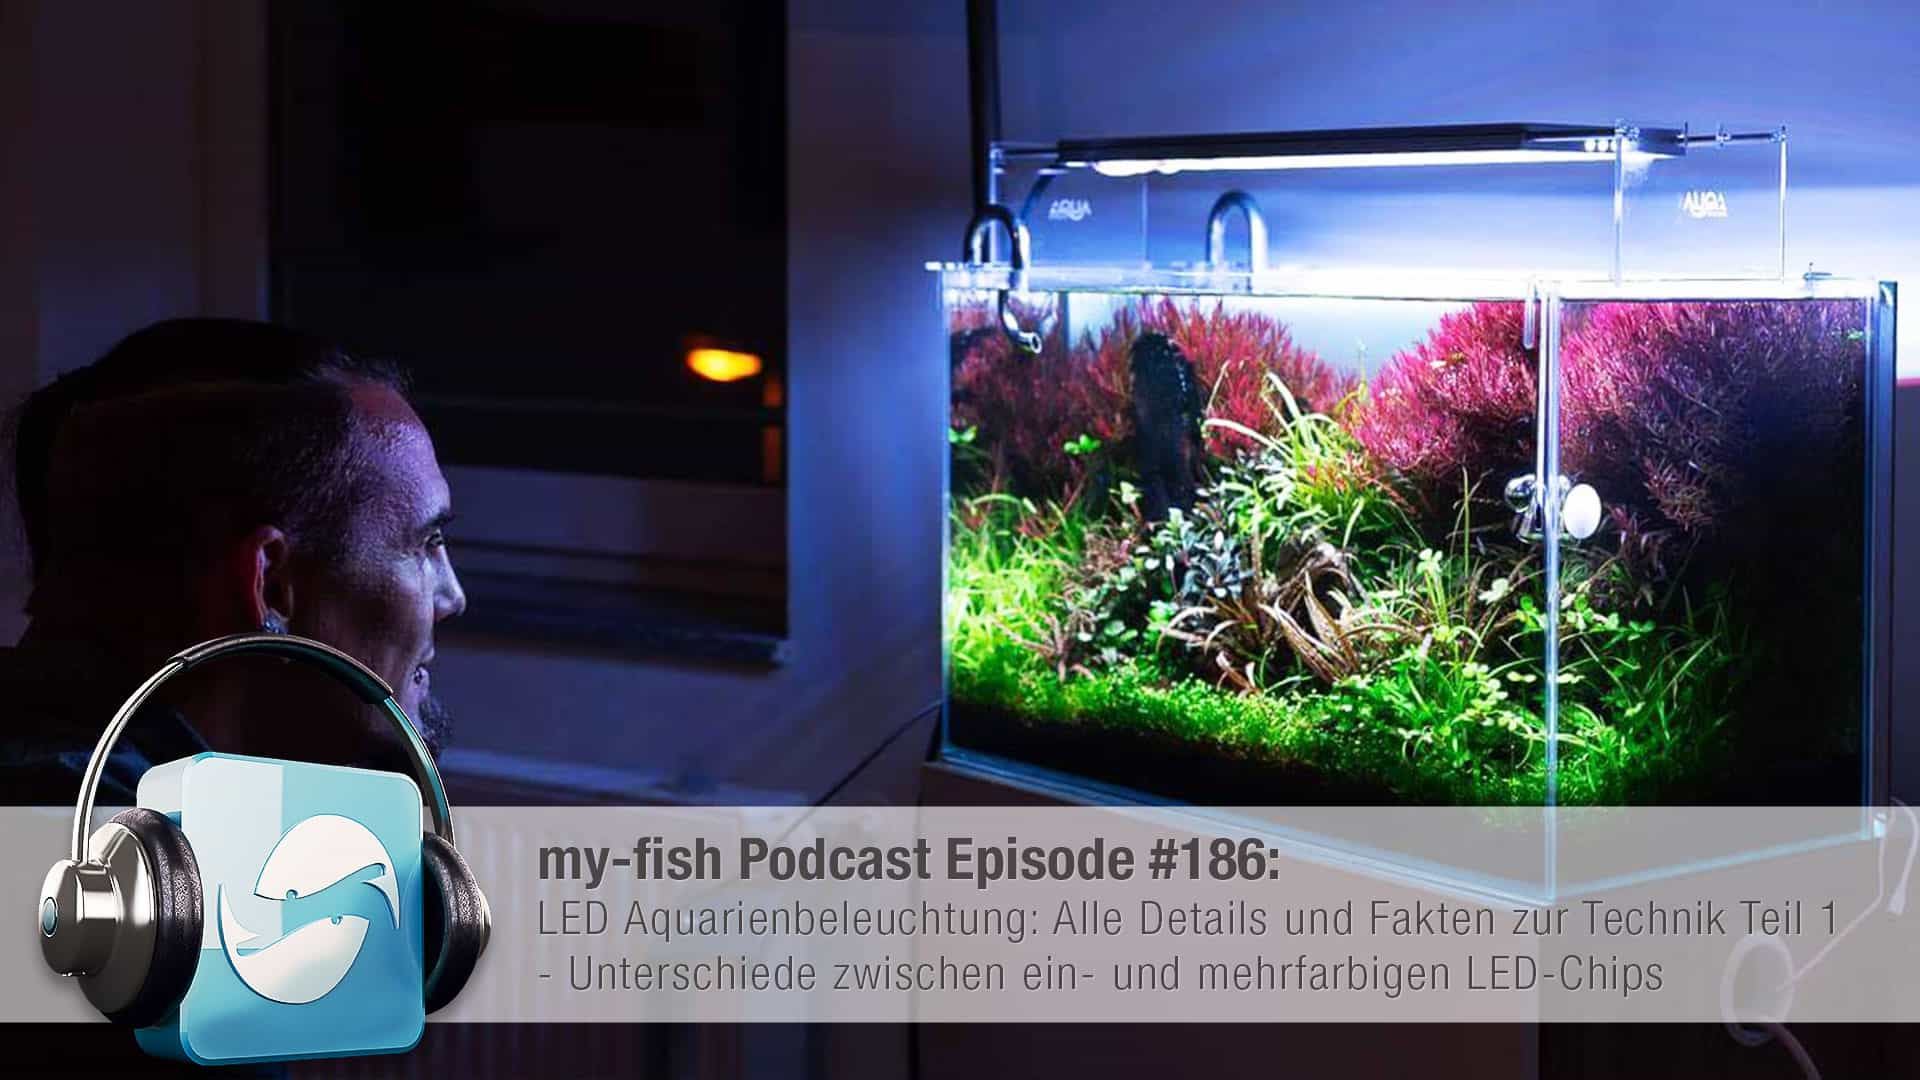 186 LED Aquarienbeleuchtung: Alle Details und Fakten zur Technik Teil 1 (Moritz Stapelfeld) 1